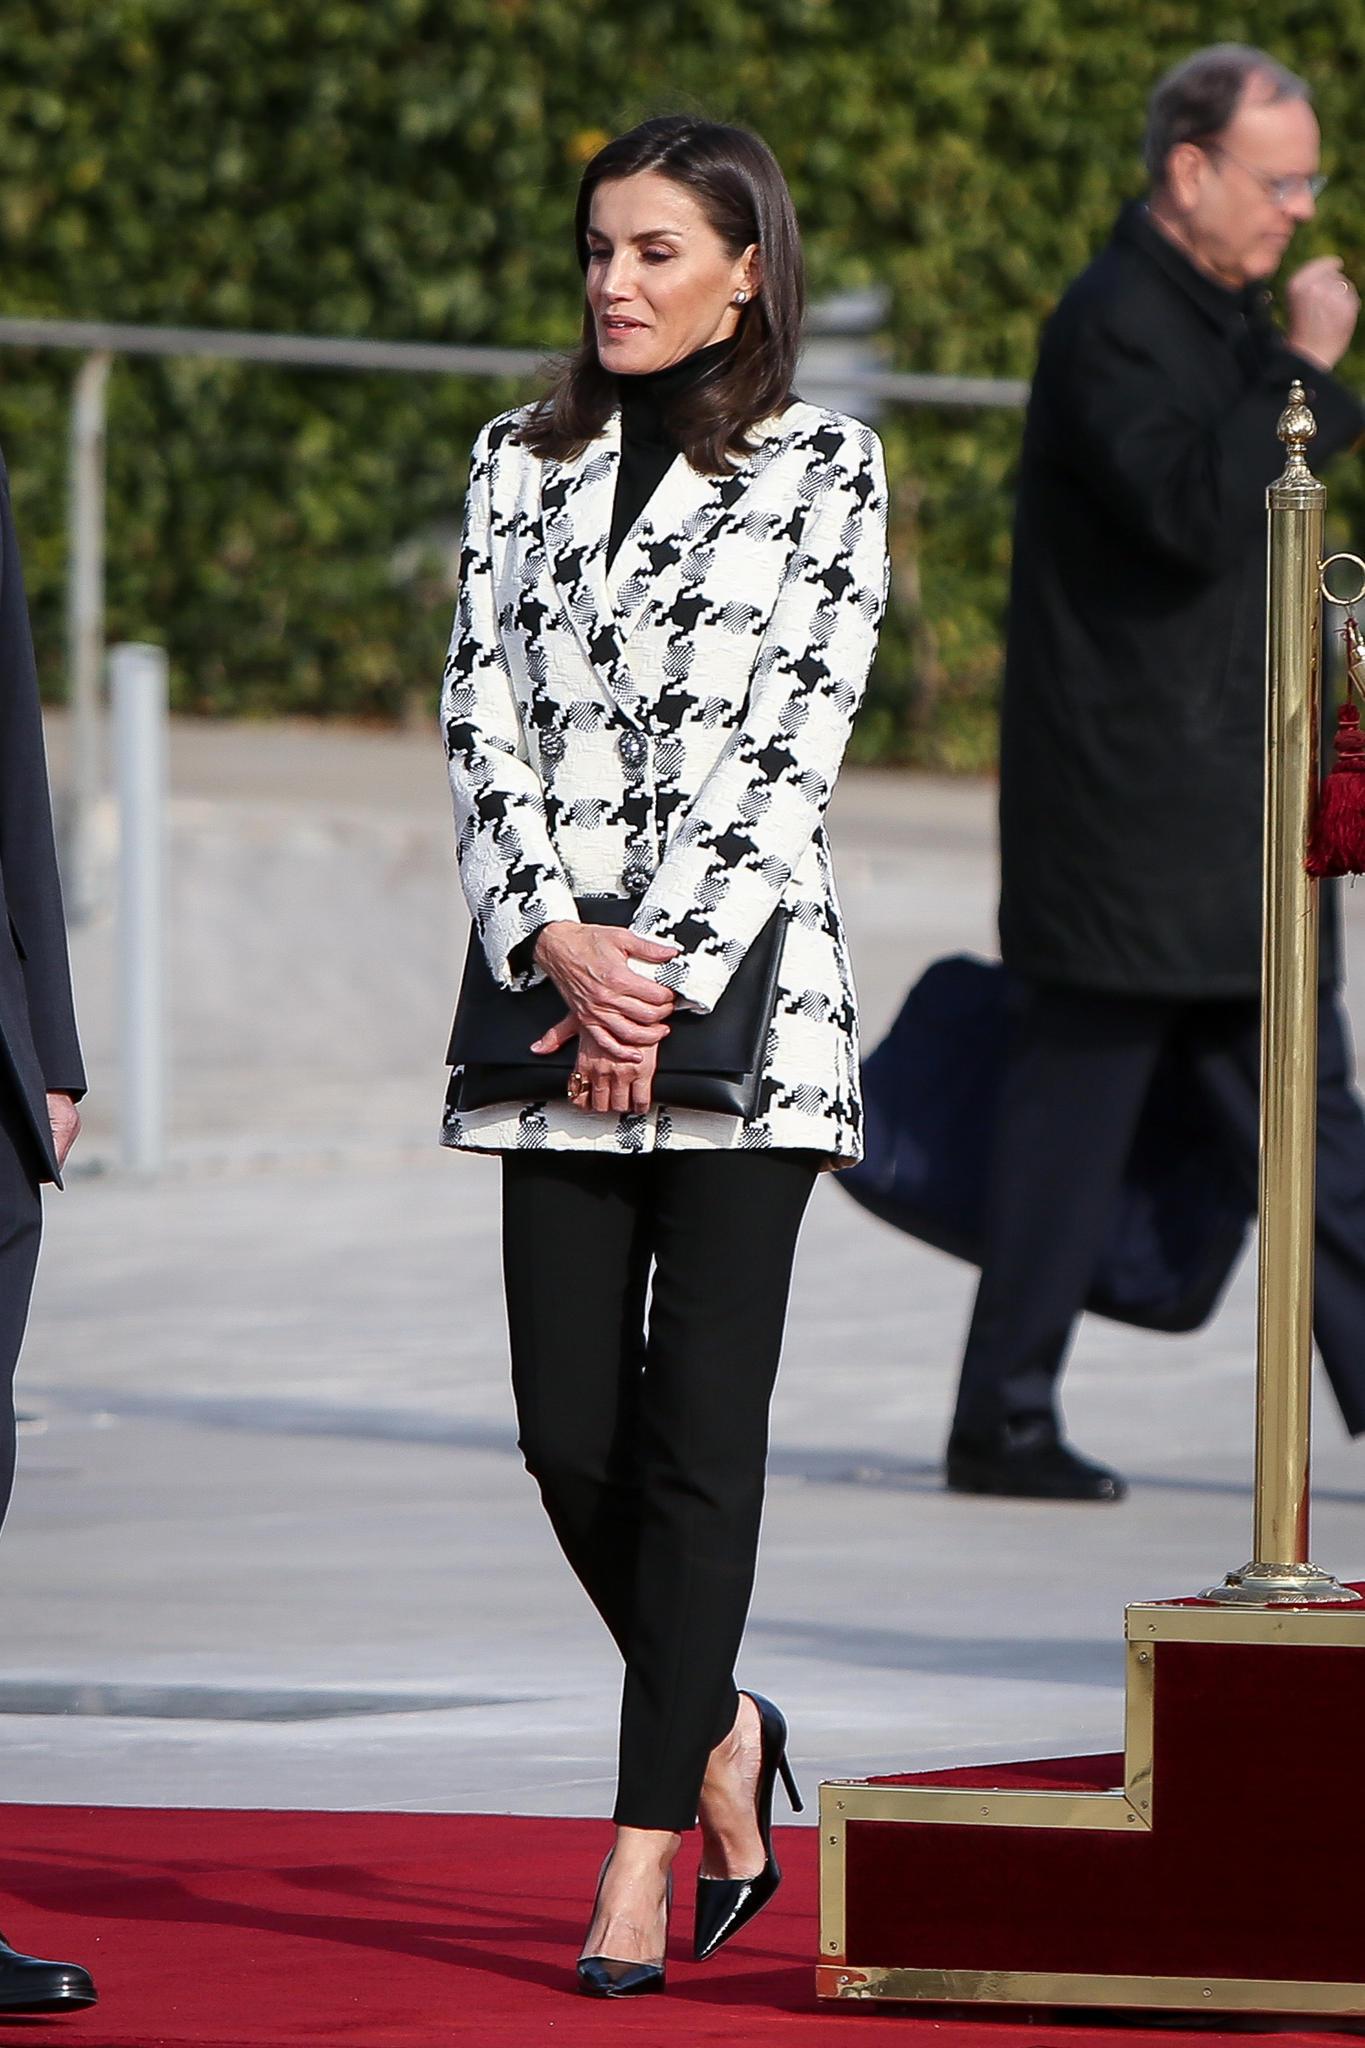 Königin Letizia auf dem Weg ins Flugzeug.